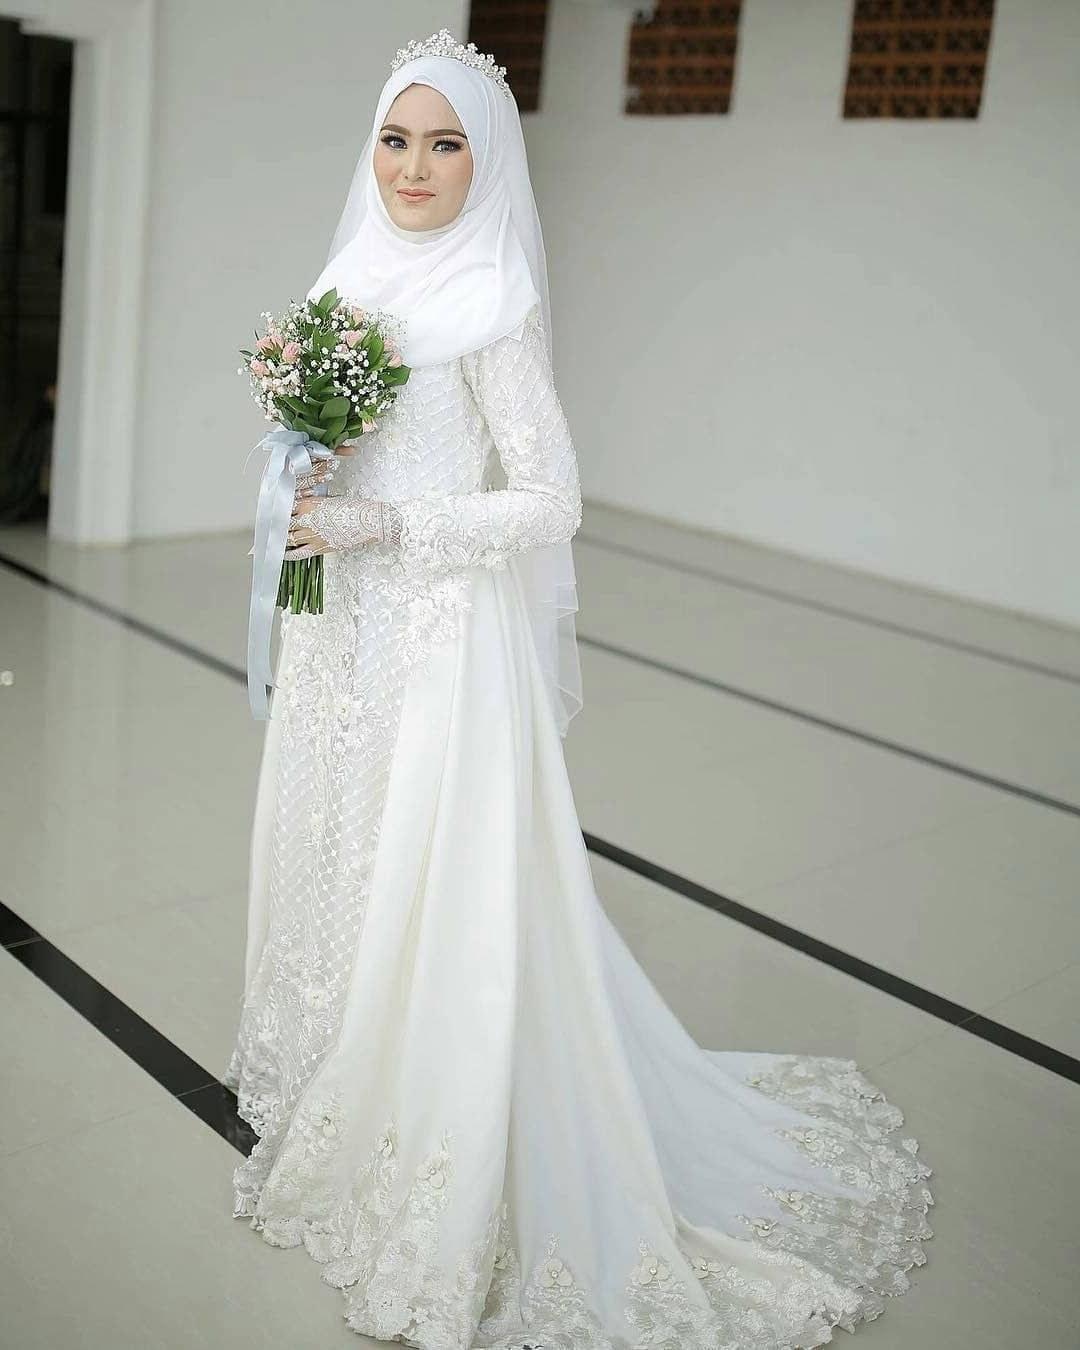 Ide Gamis Untuk Pernikahan Mndw Celeste Eng Celesteeng On Pinterest